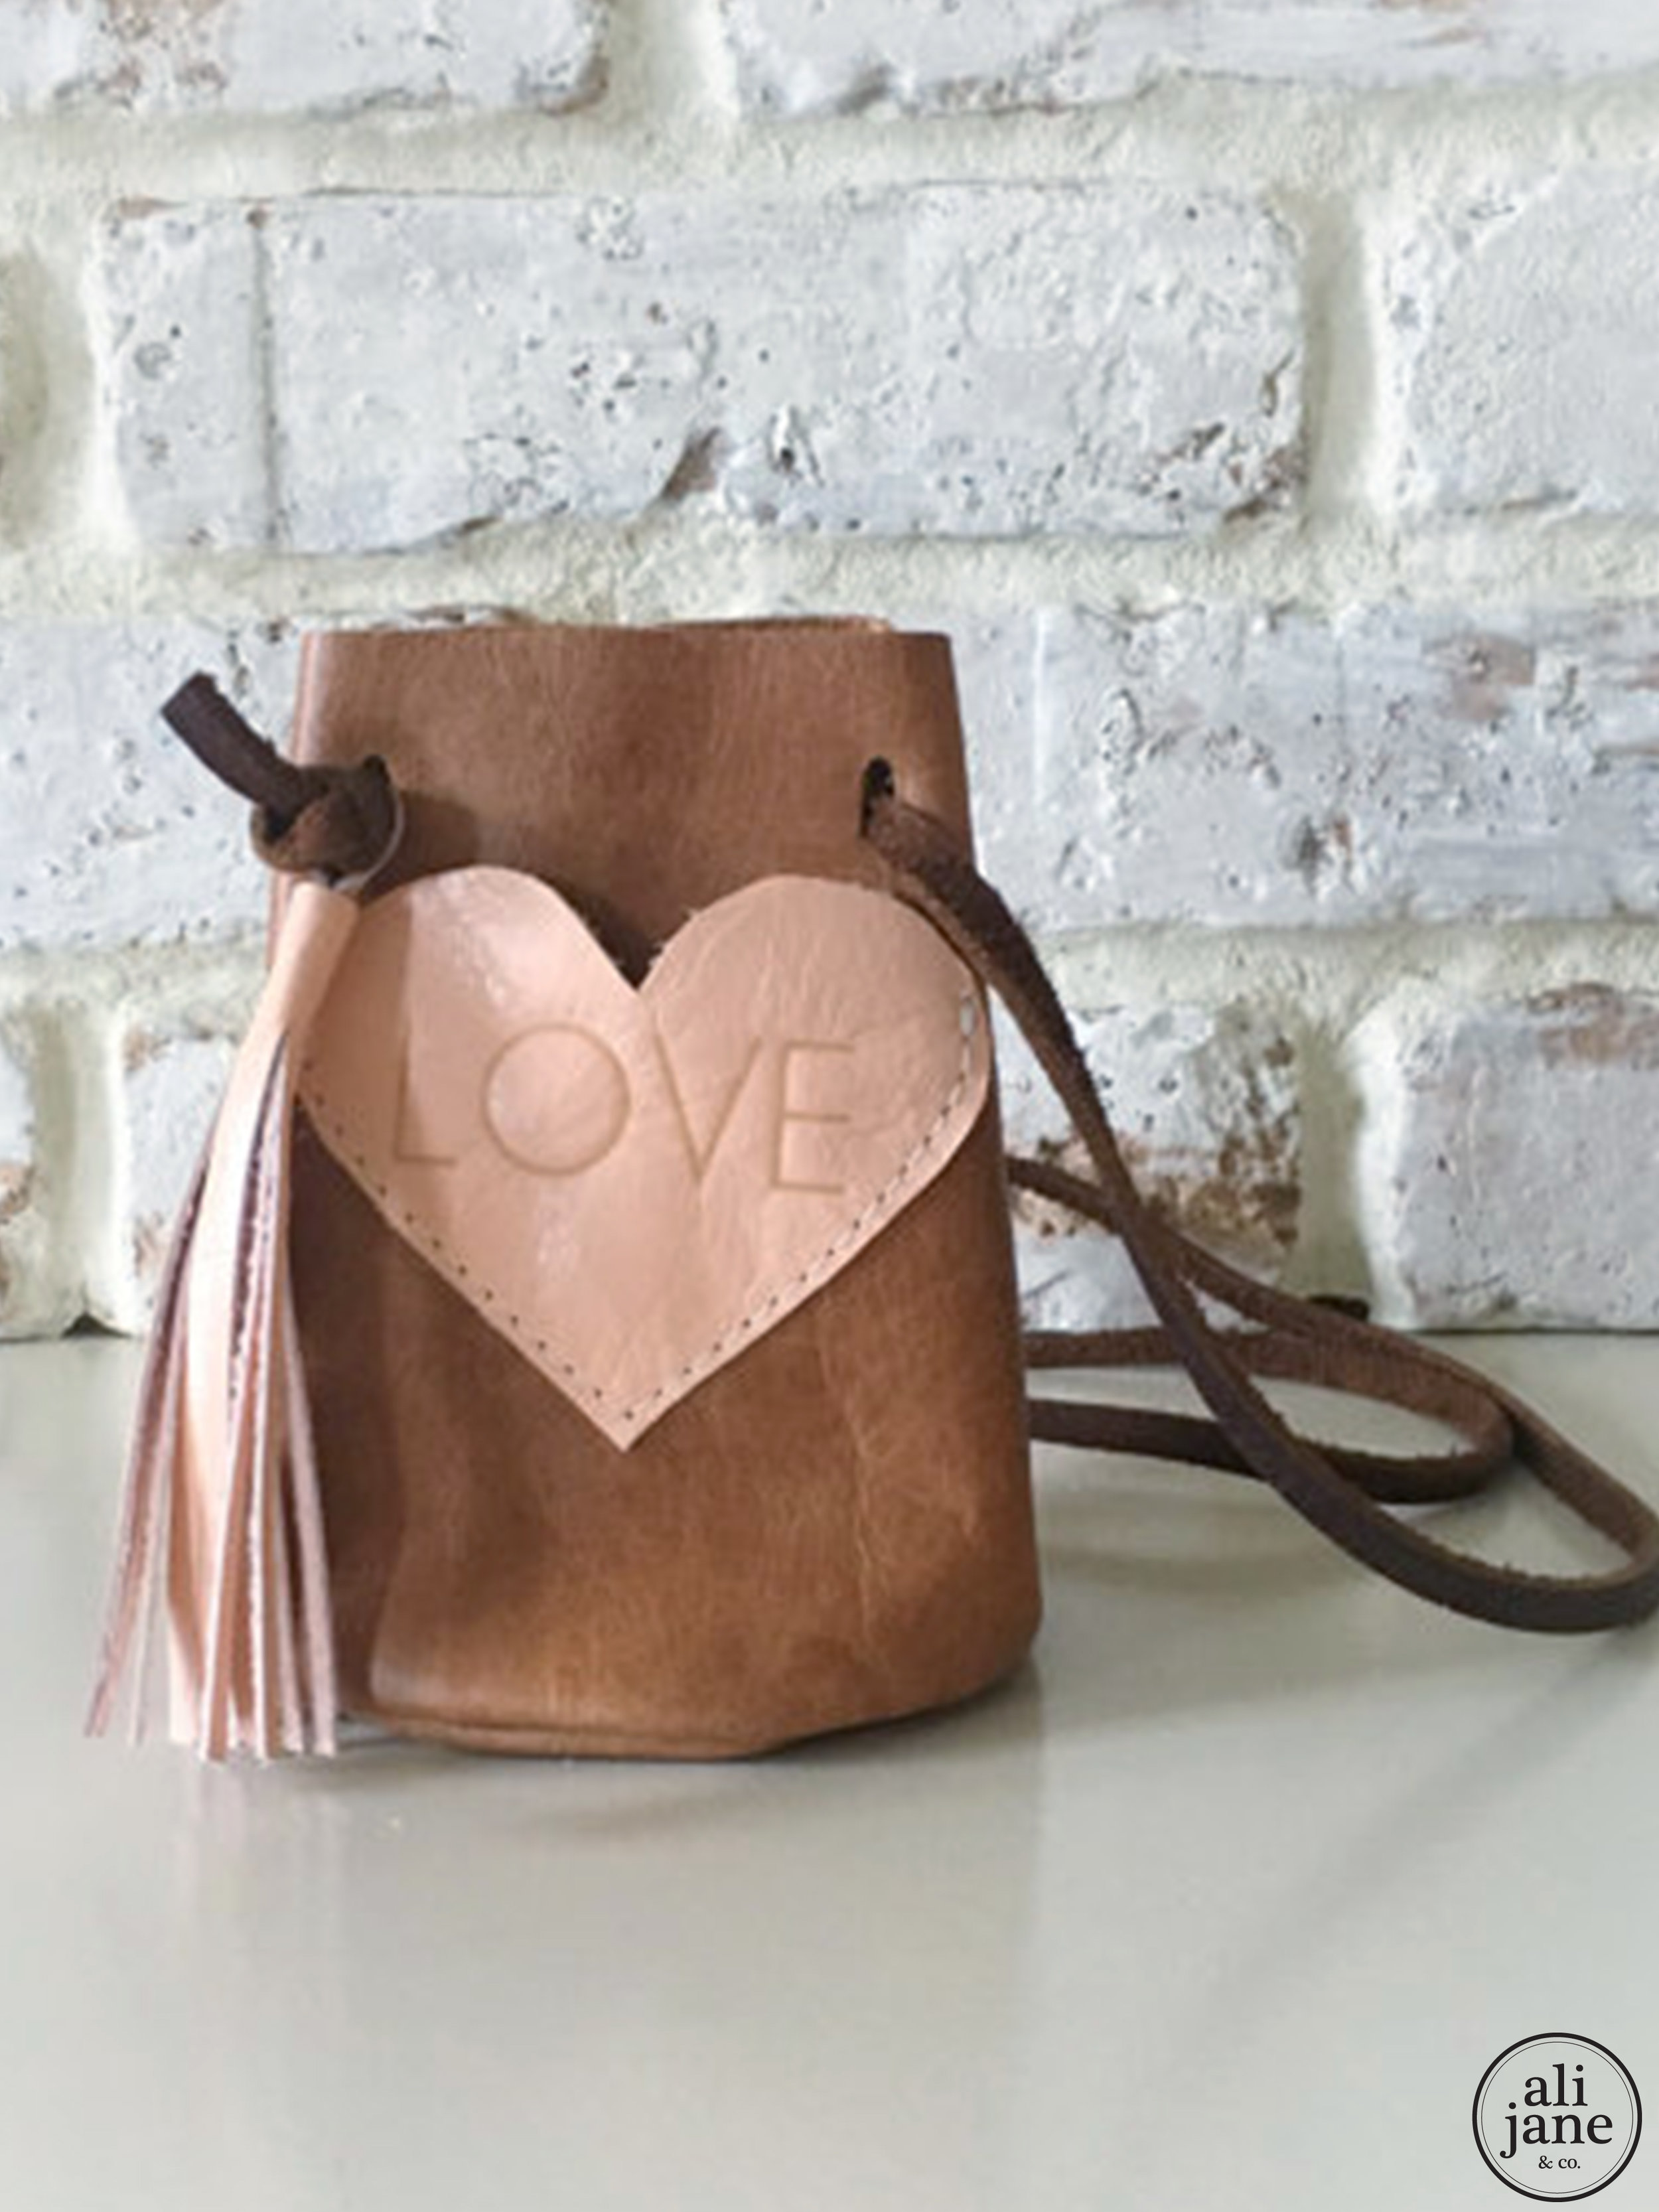 Girl's tan leather LOVE purse